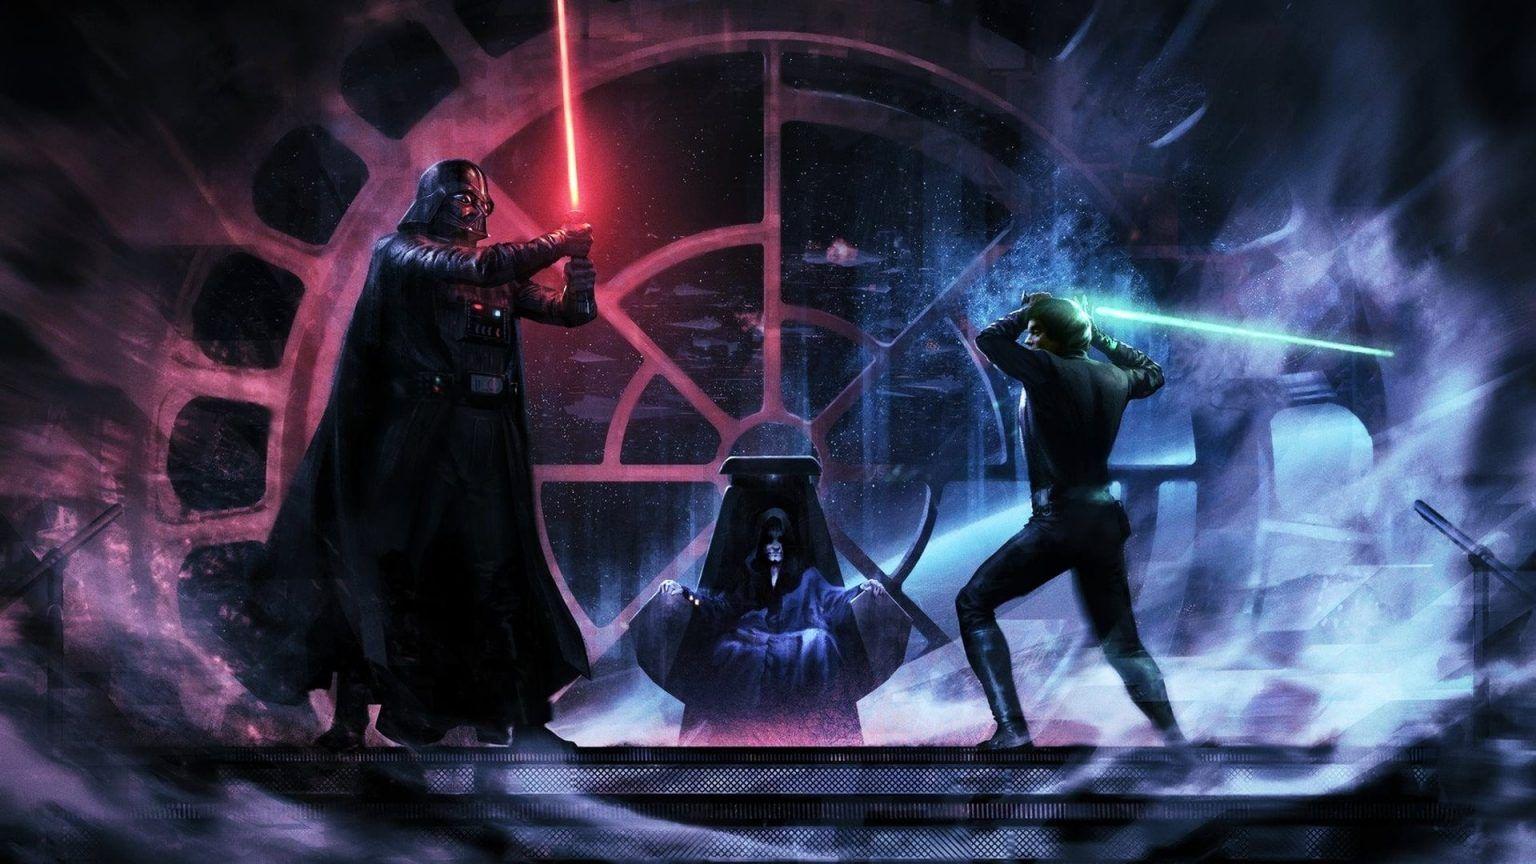 Movie Star Wars Episode Vi Return Of The Jedi Star Wars Star Wars Episode Vi Return Of The Jedi Darth In 2020 Star Wars Wallpaper Darth Vader Wallpaper Vader Star Wars